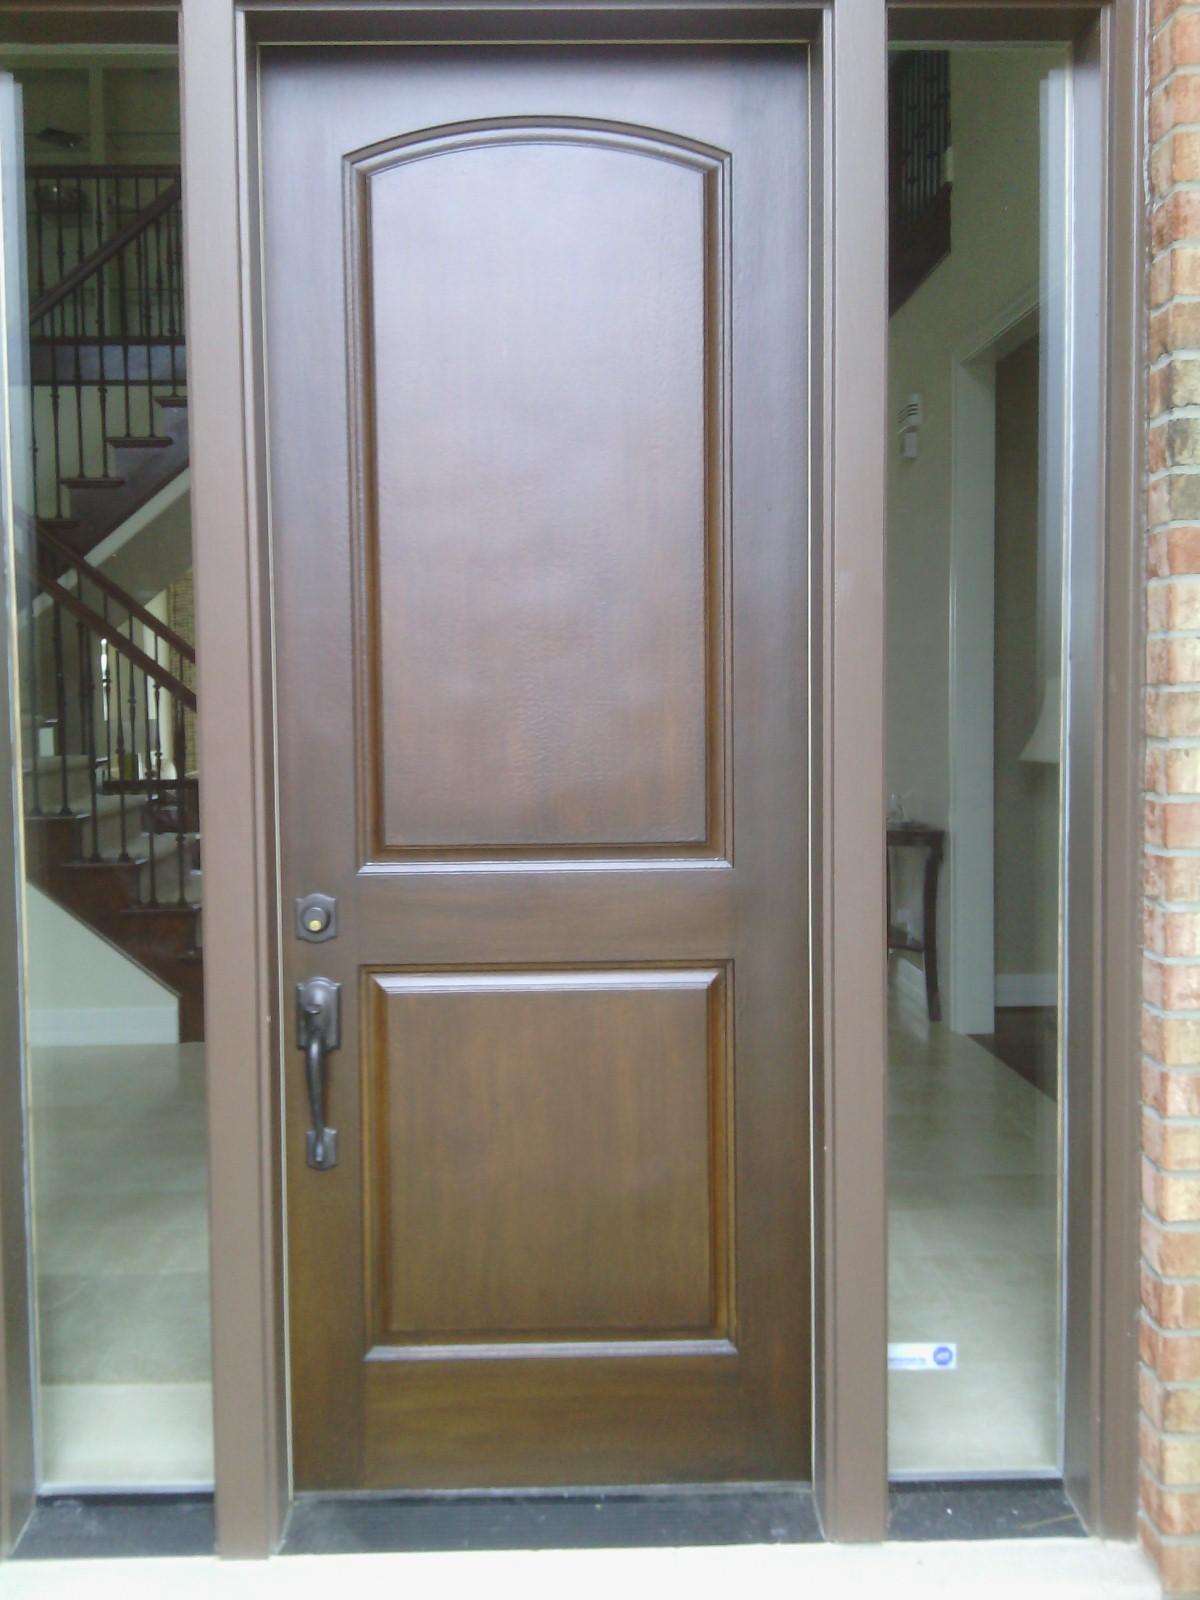 fiberglass-door-refinish-refinishing-restore-restoration-renew